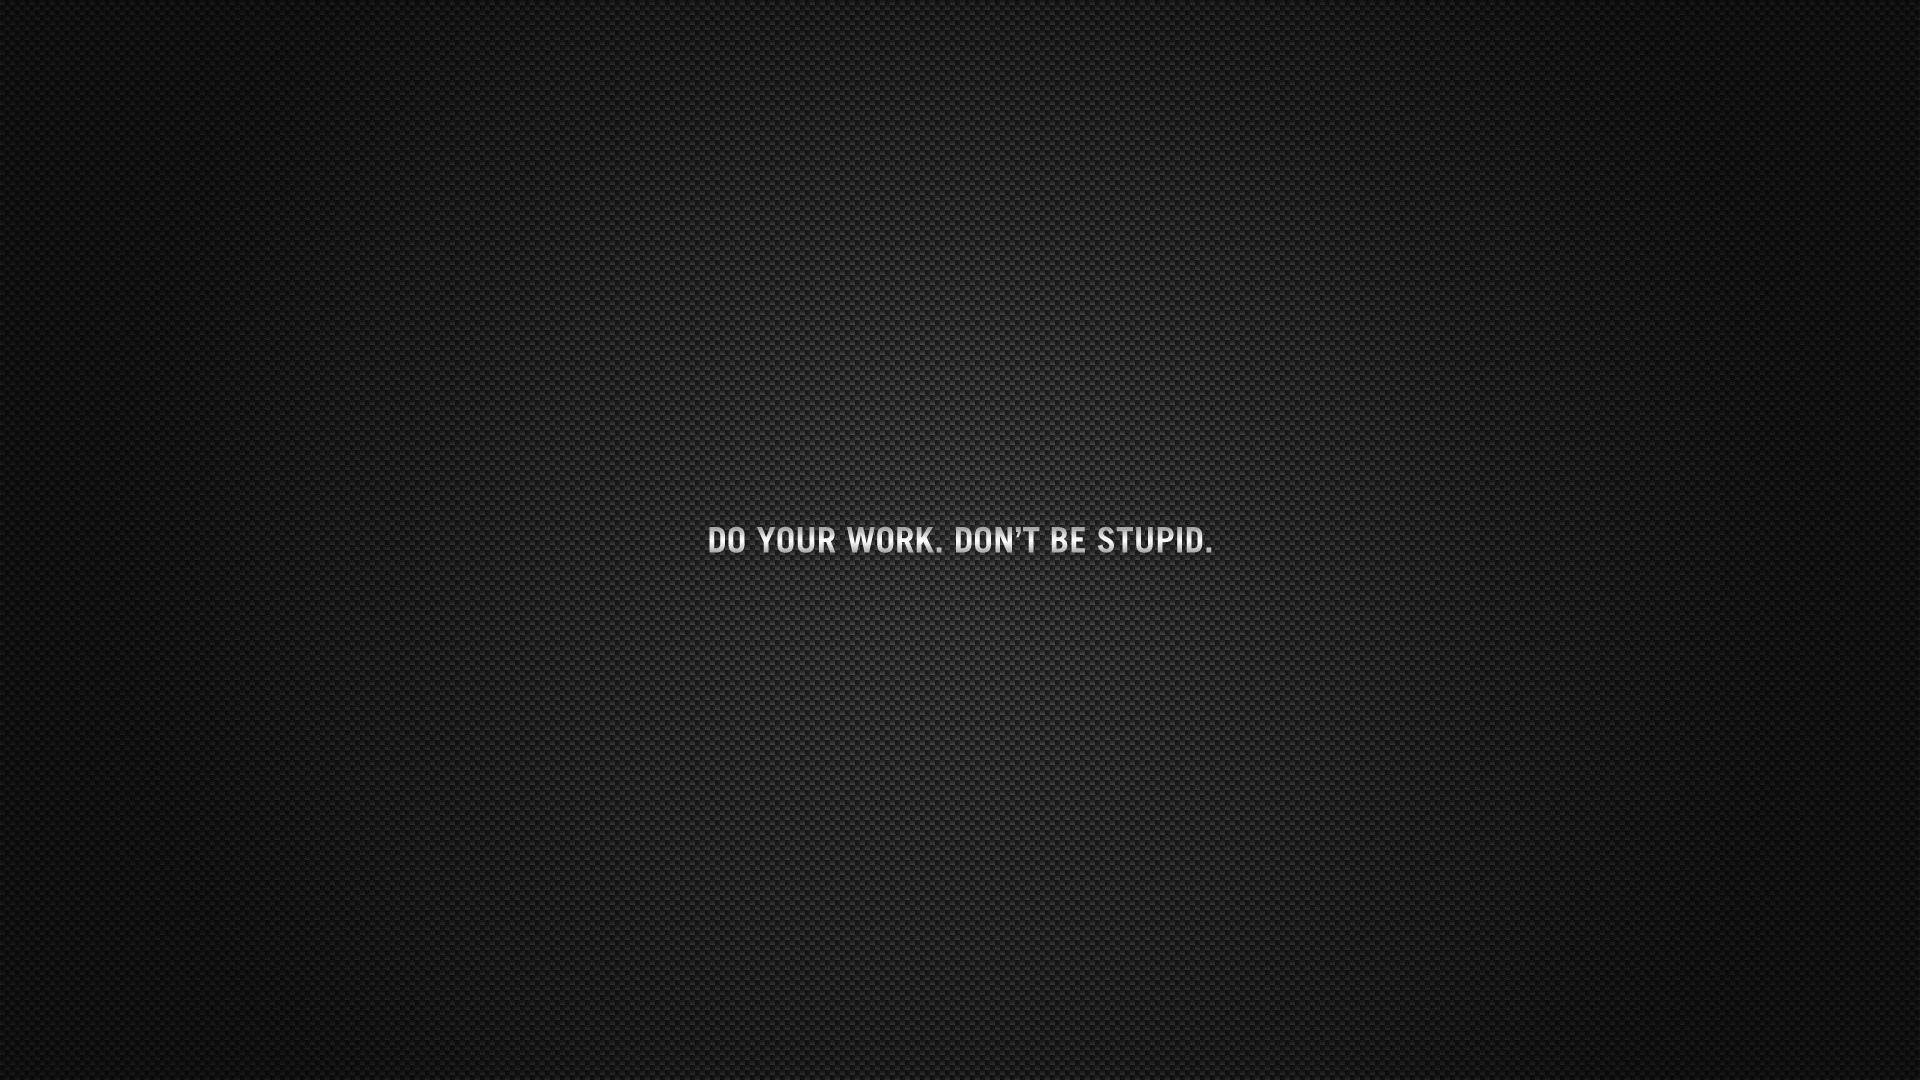 обои работа: